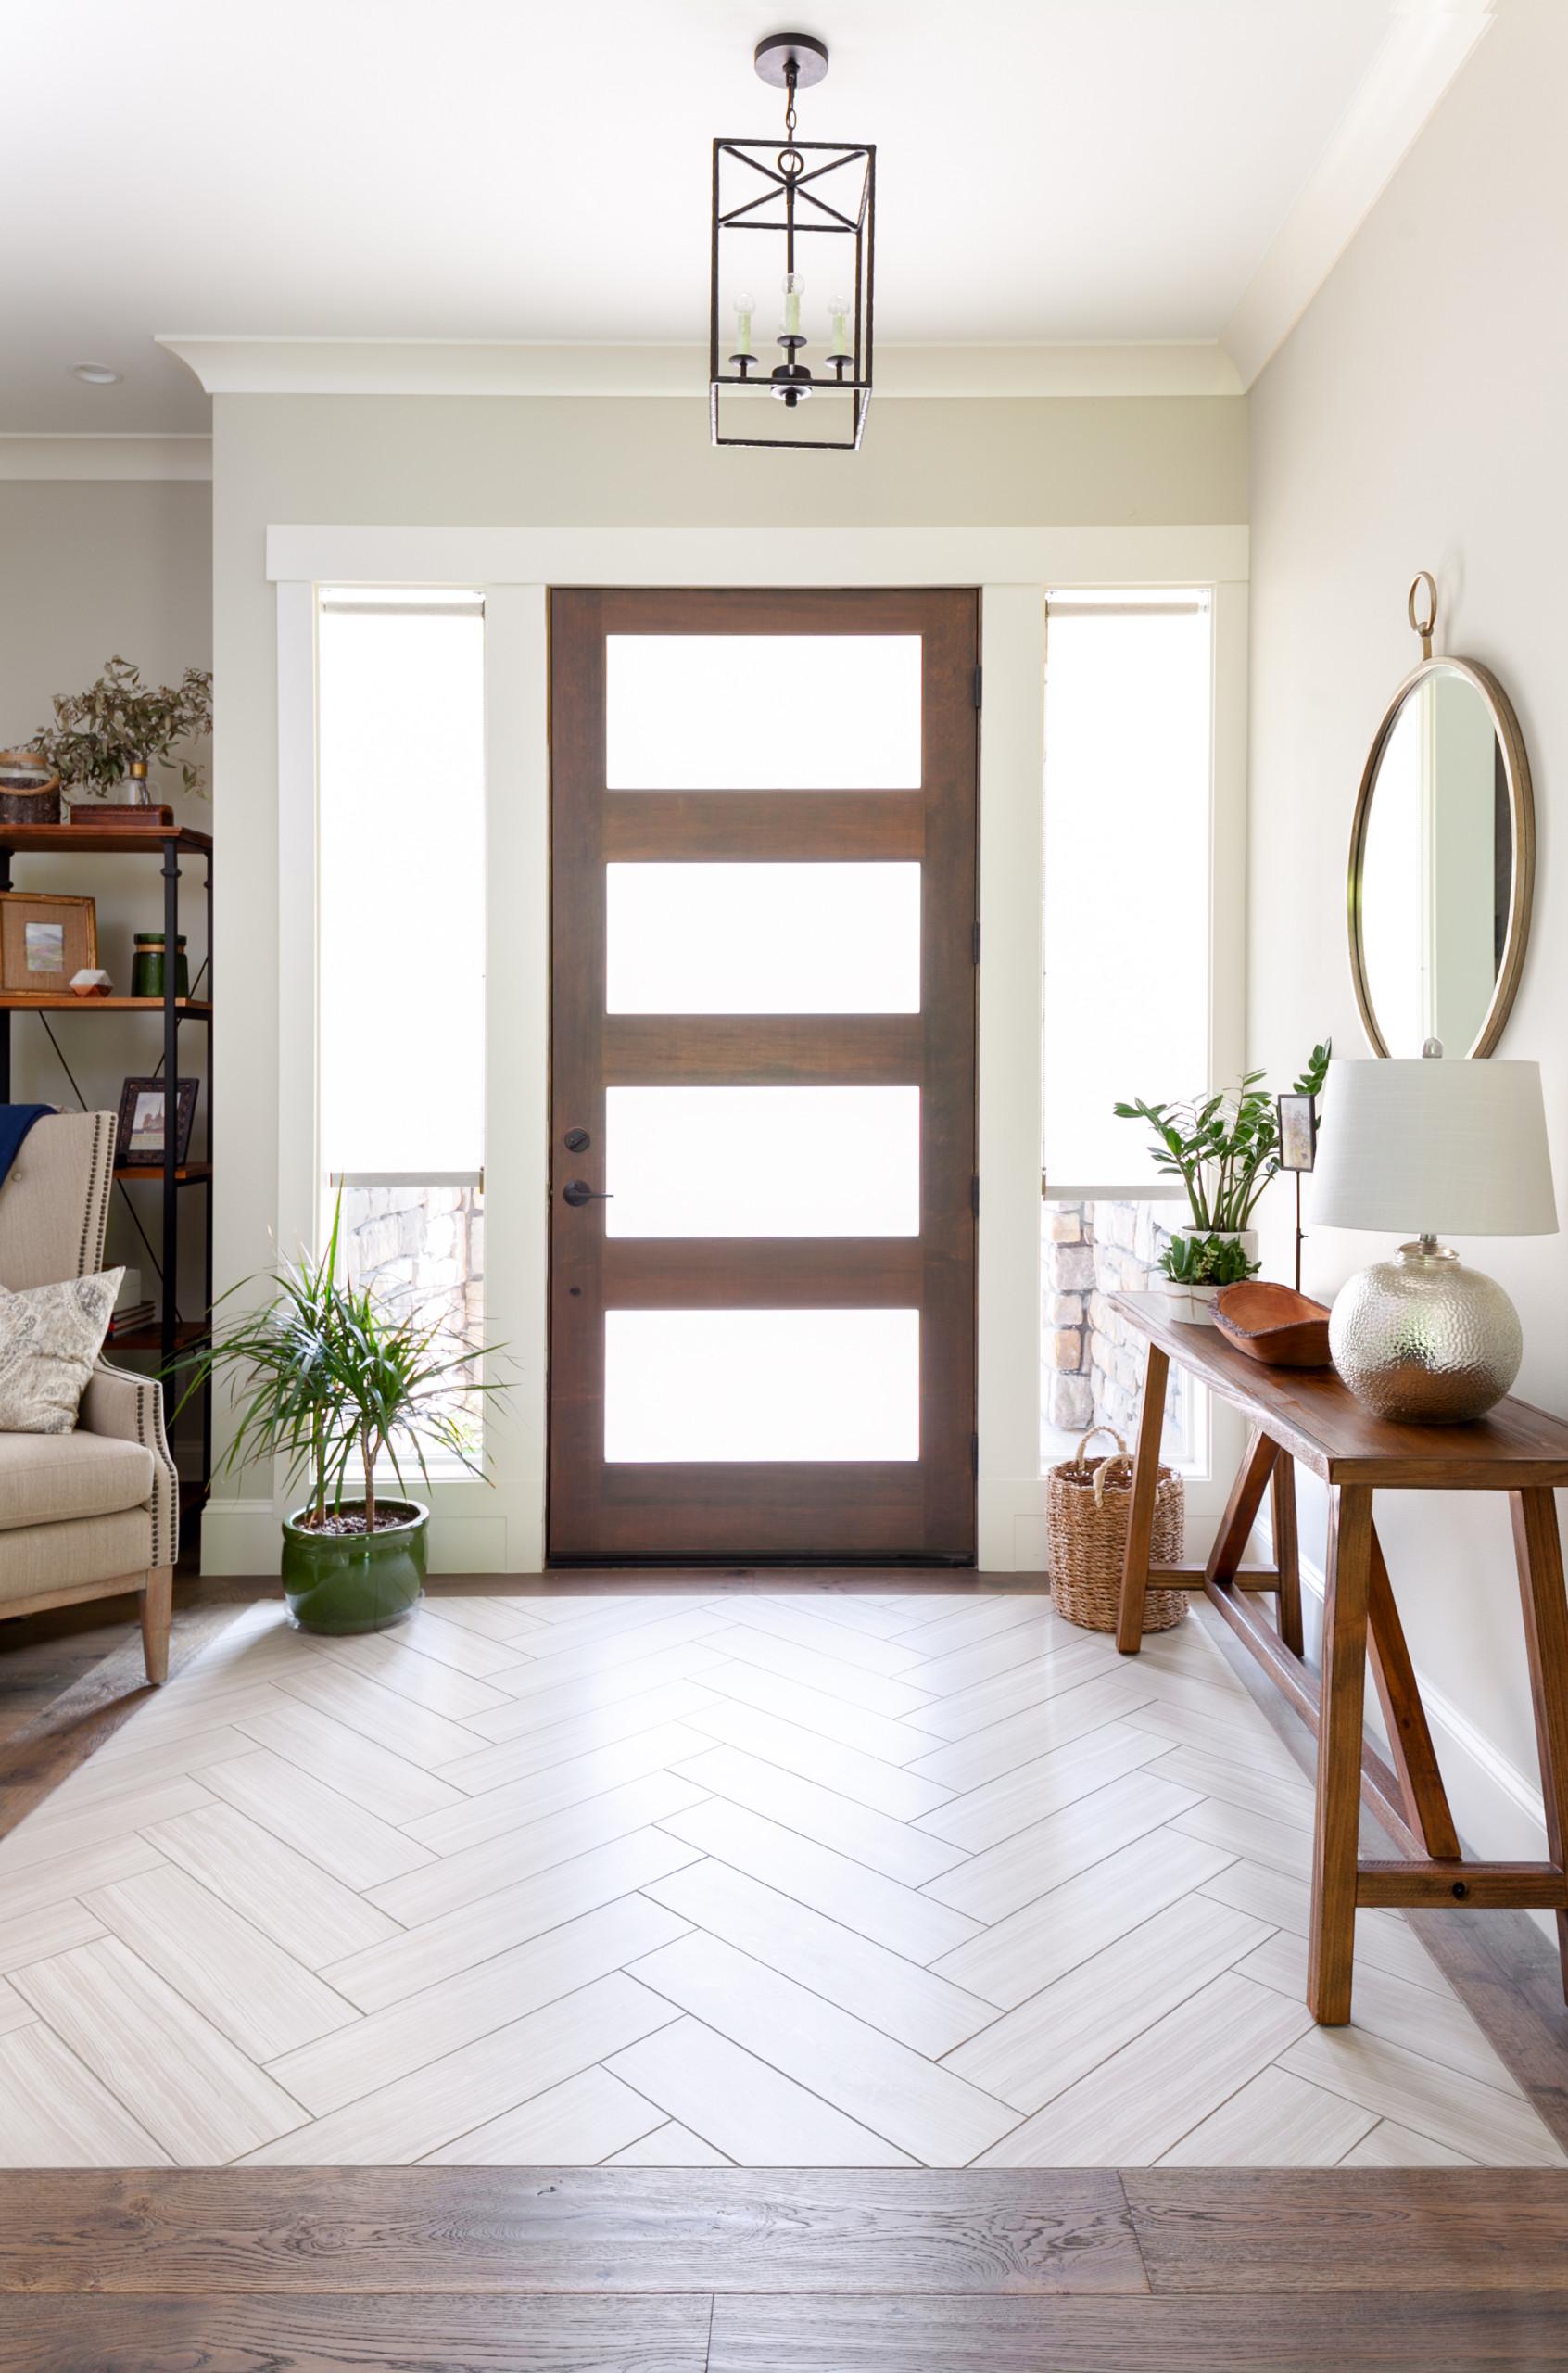 Herringbone Pattern Tile Entry Ideas & Photos | Houzz